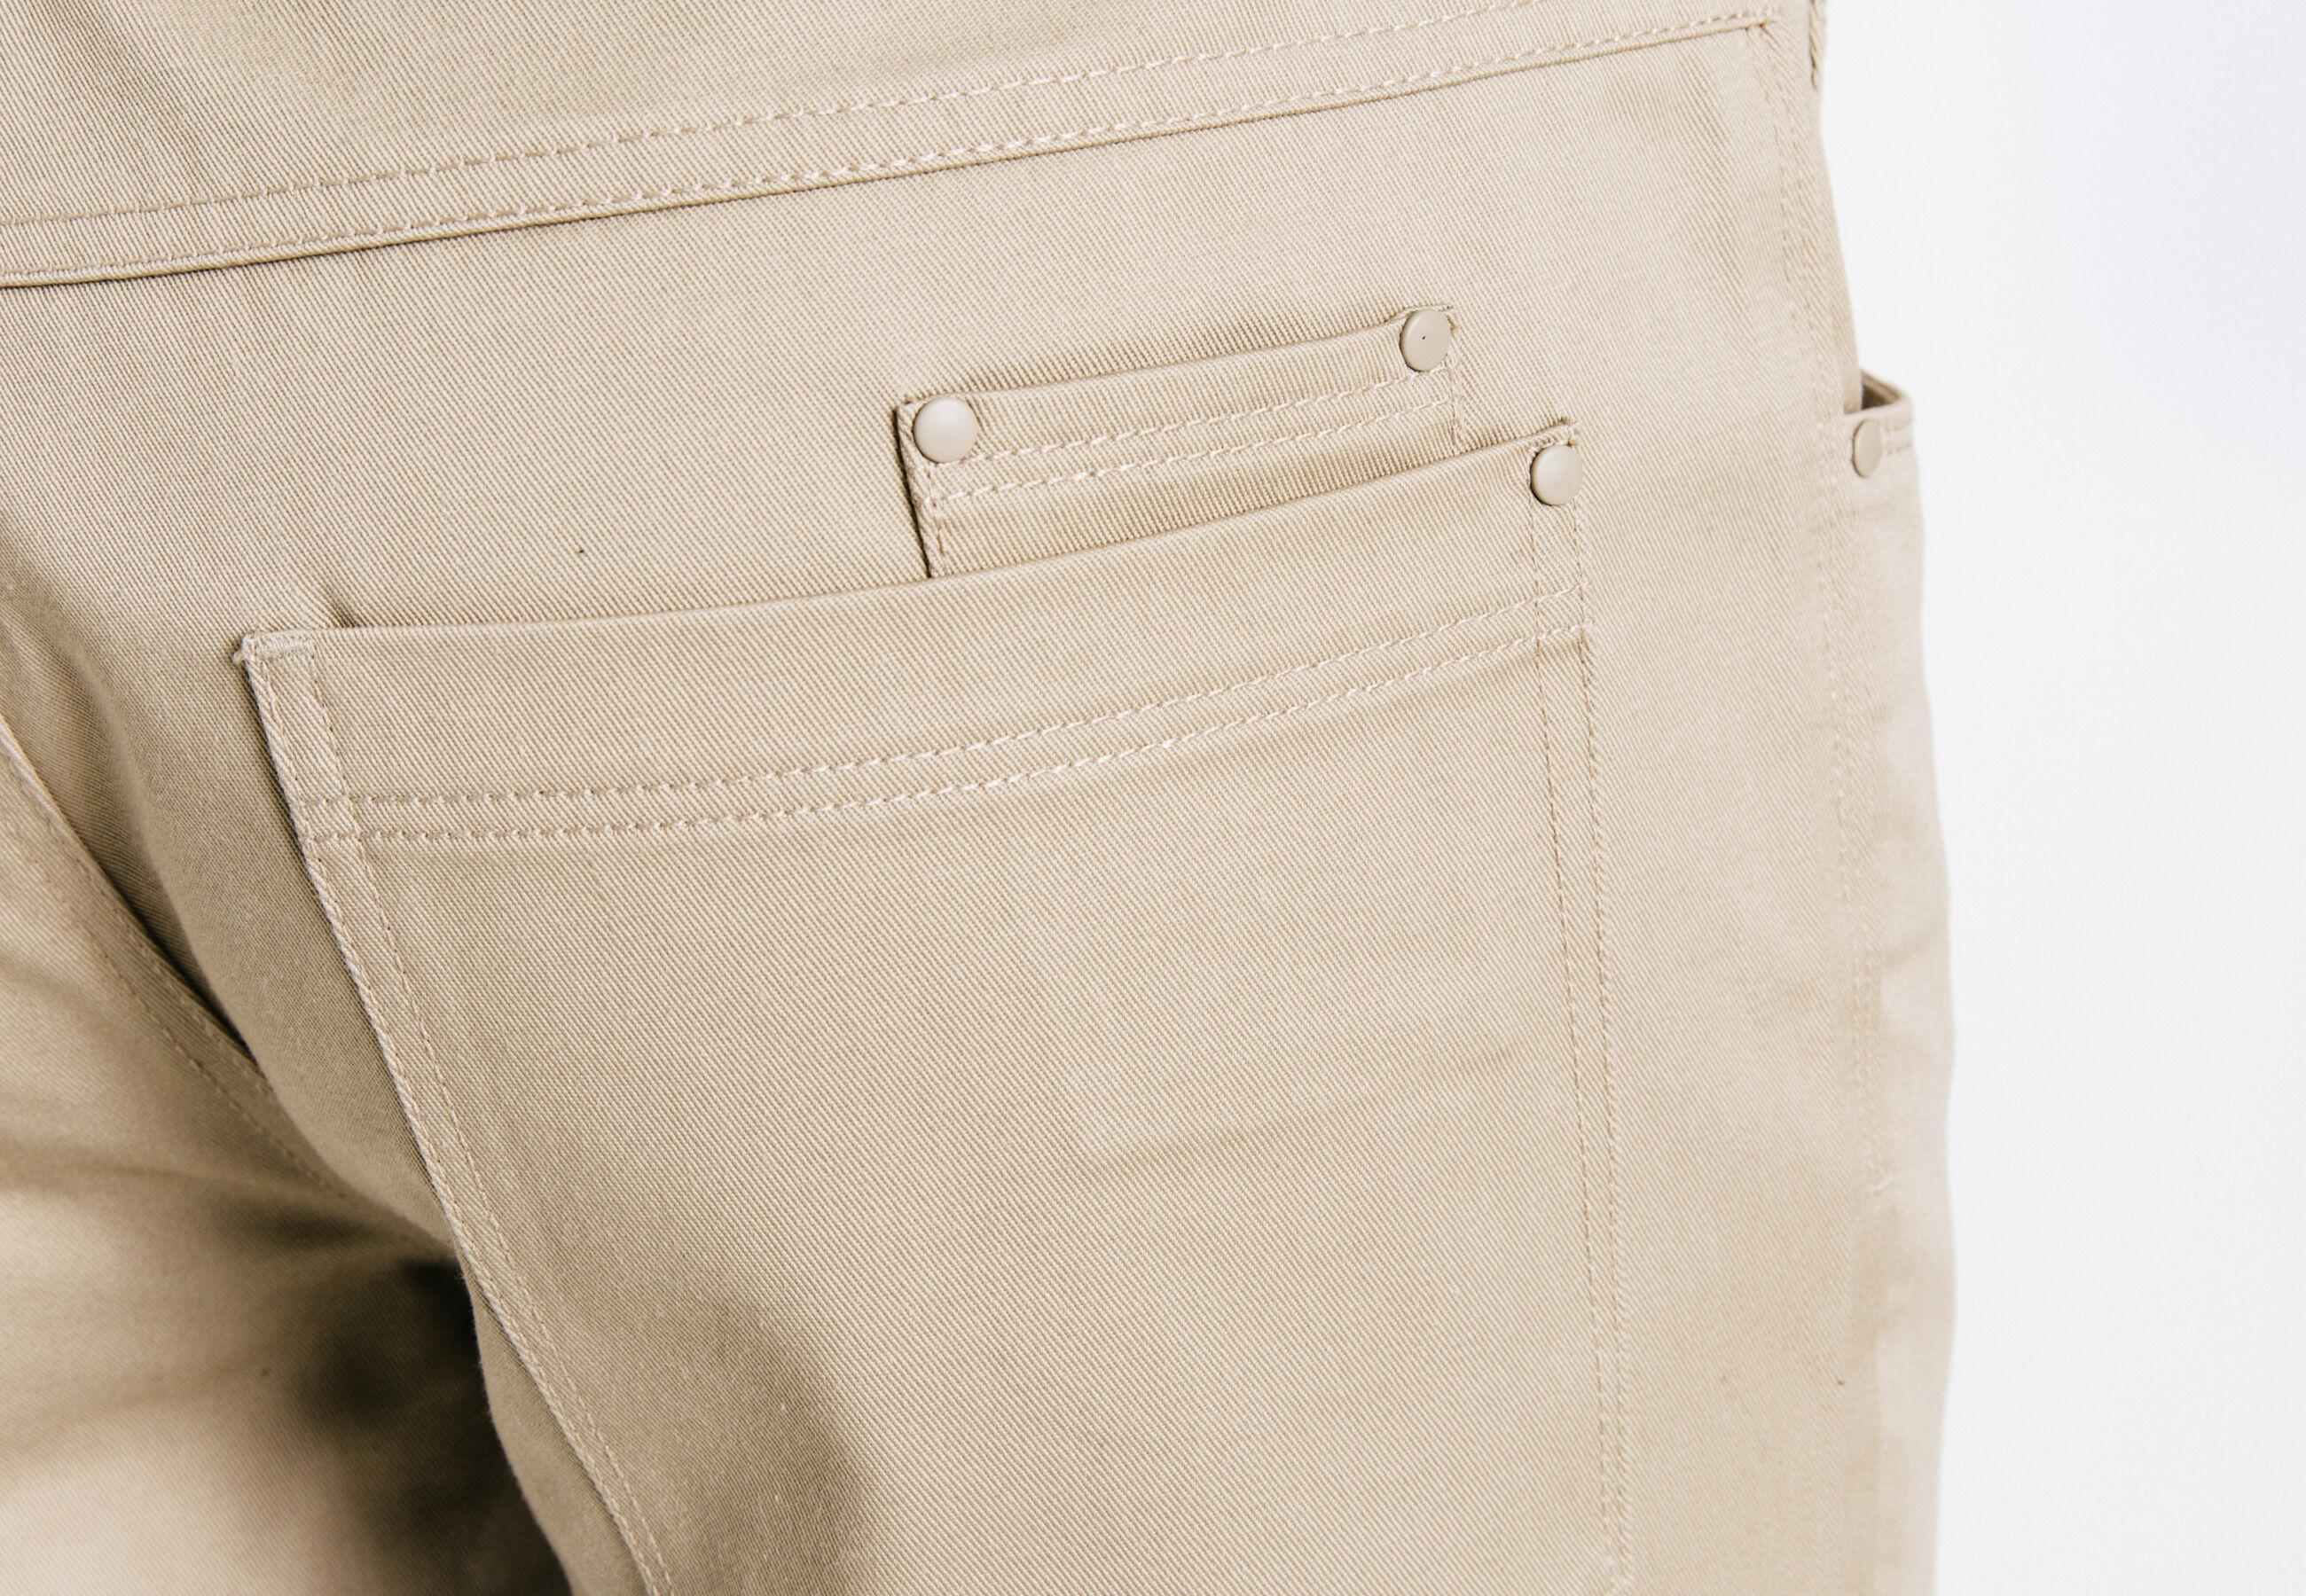 pantalon 5 poches straight beige homme jules. Black Bedroom Furniture Sets. Home Design Ideas